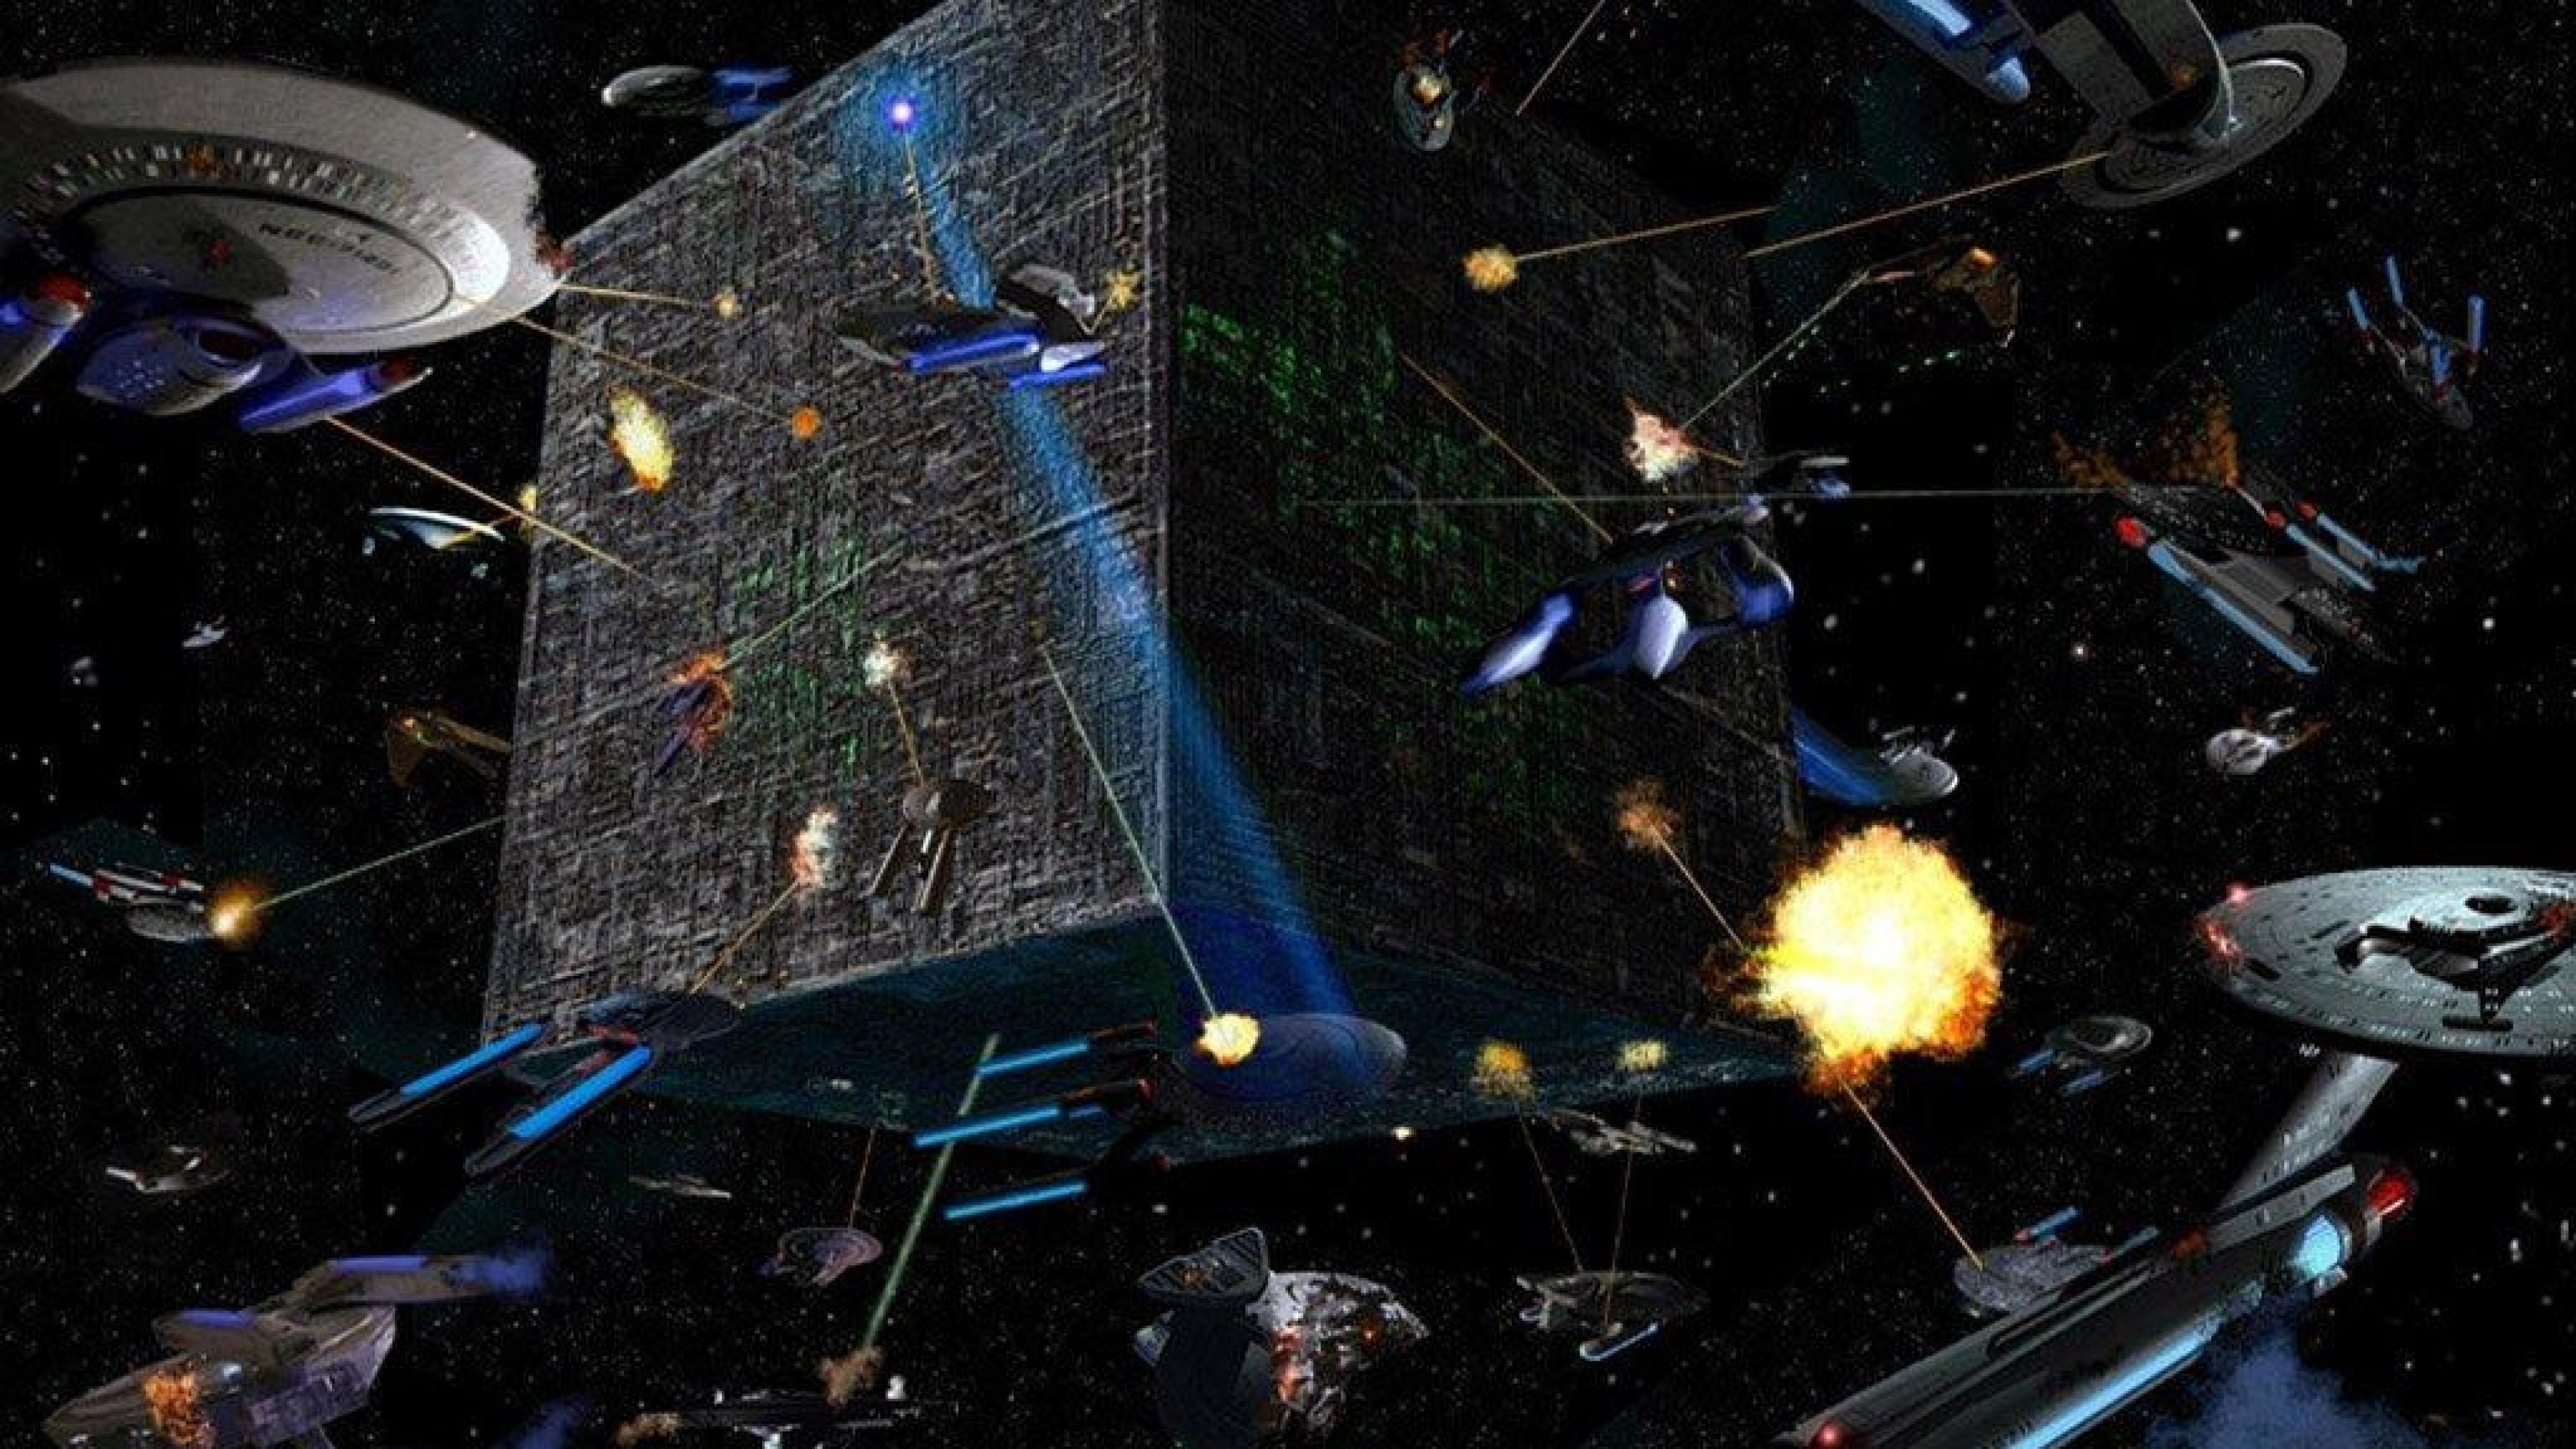 wallpaper.wiki-Download-Borg-Star-Trek-Picture-PIC-